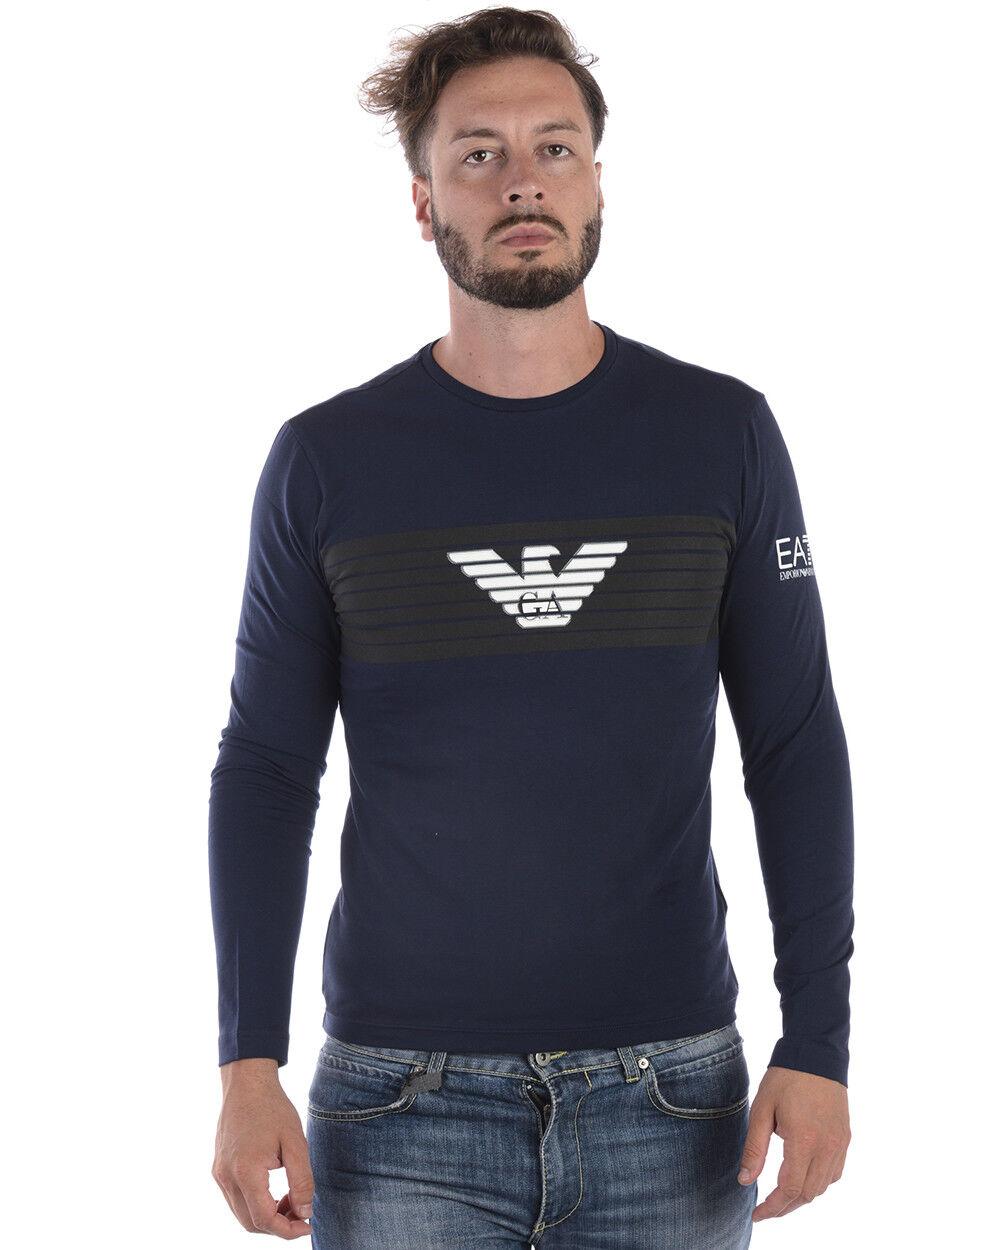 T shirt Maglietta Emporio Armani Ea7 Sweatshirt Cotone  Herren Blu 6ZPT30PJ18Z 1554